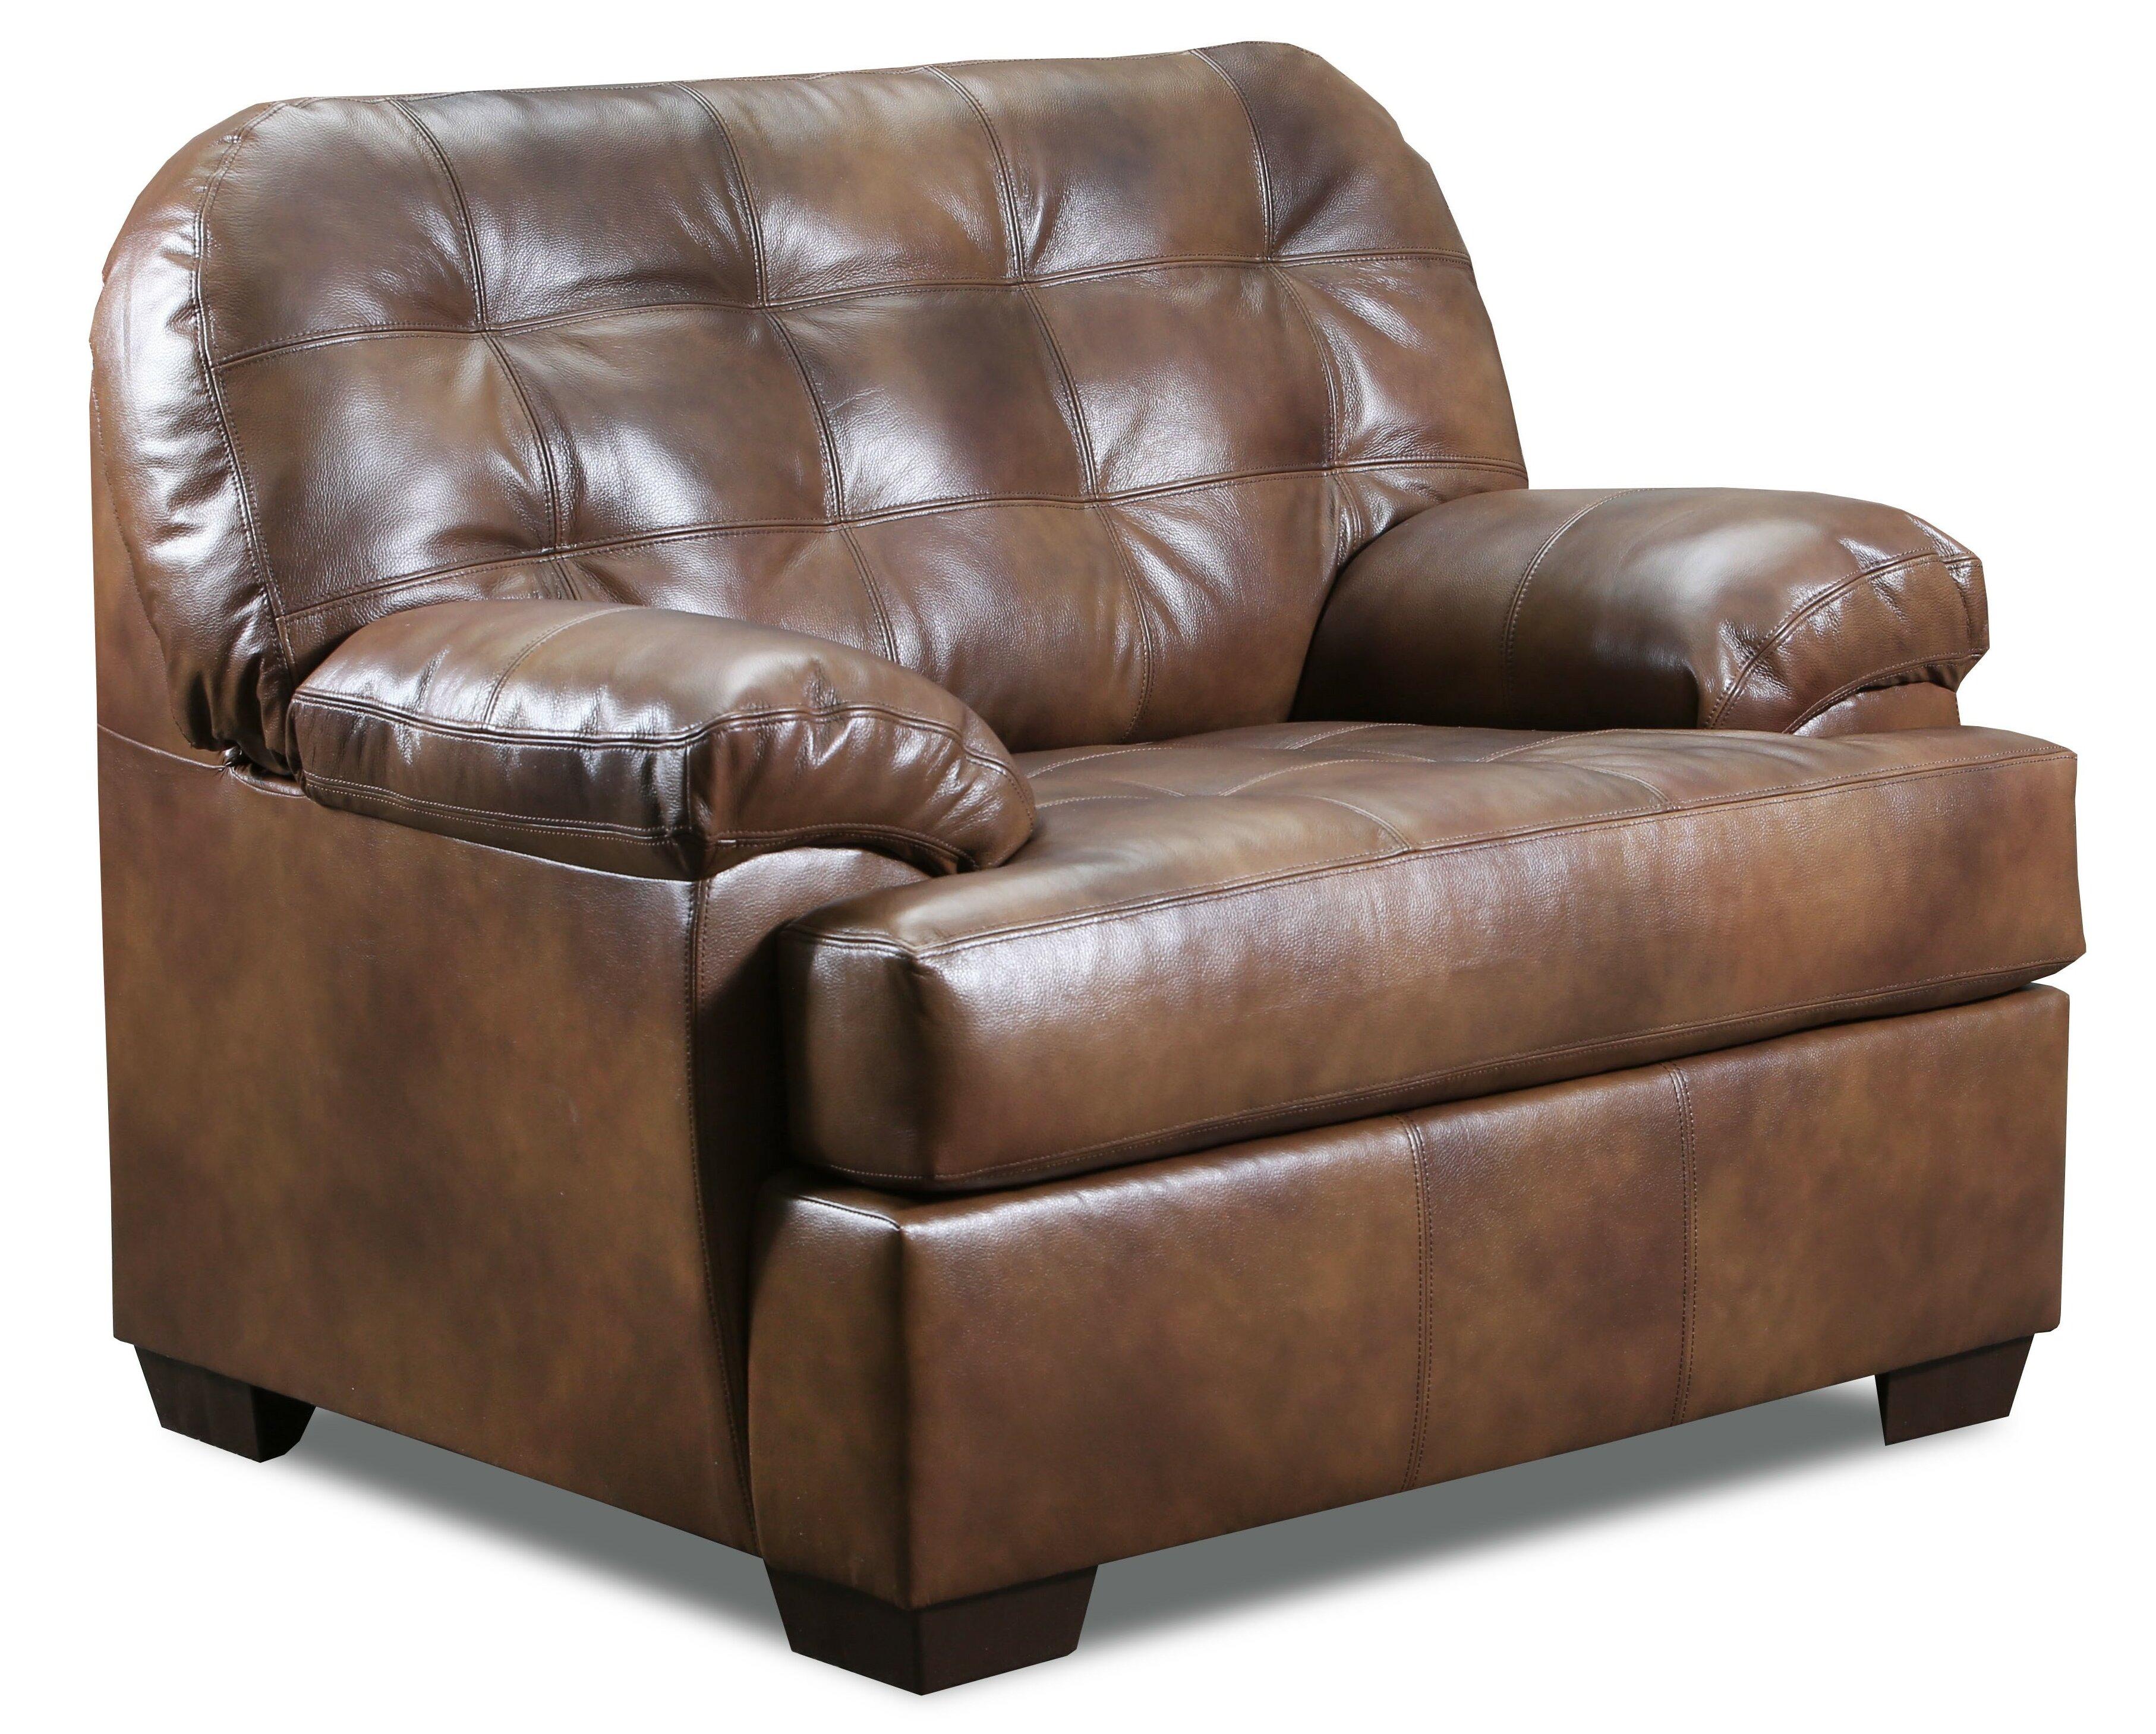 Top Grain Leather Match Armchair